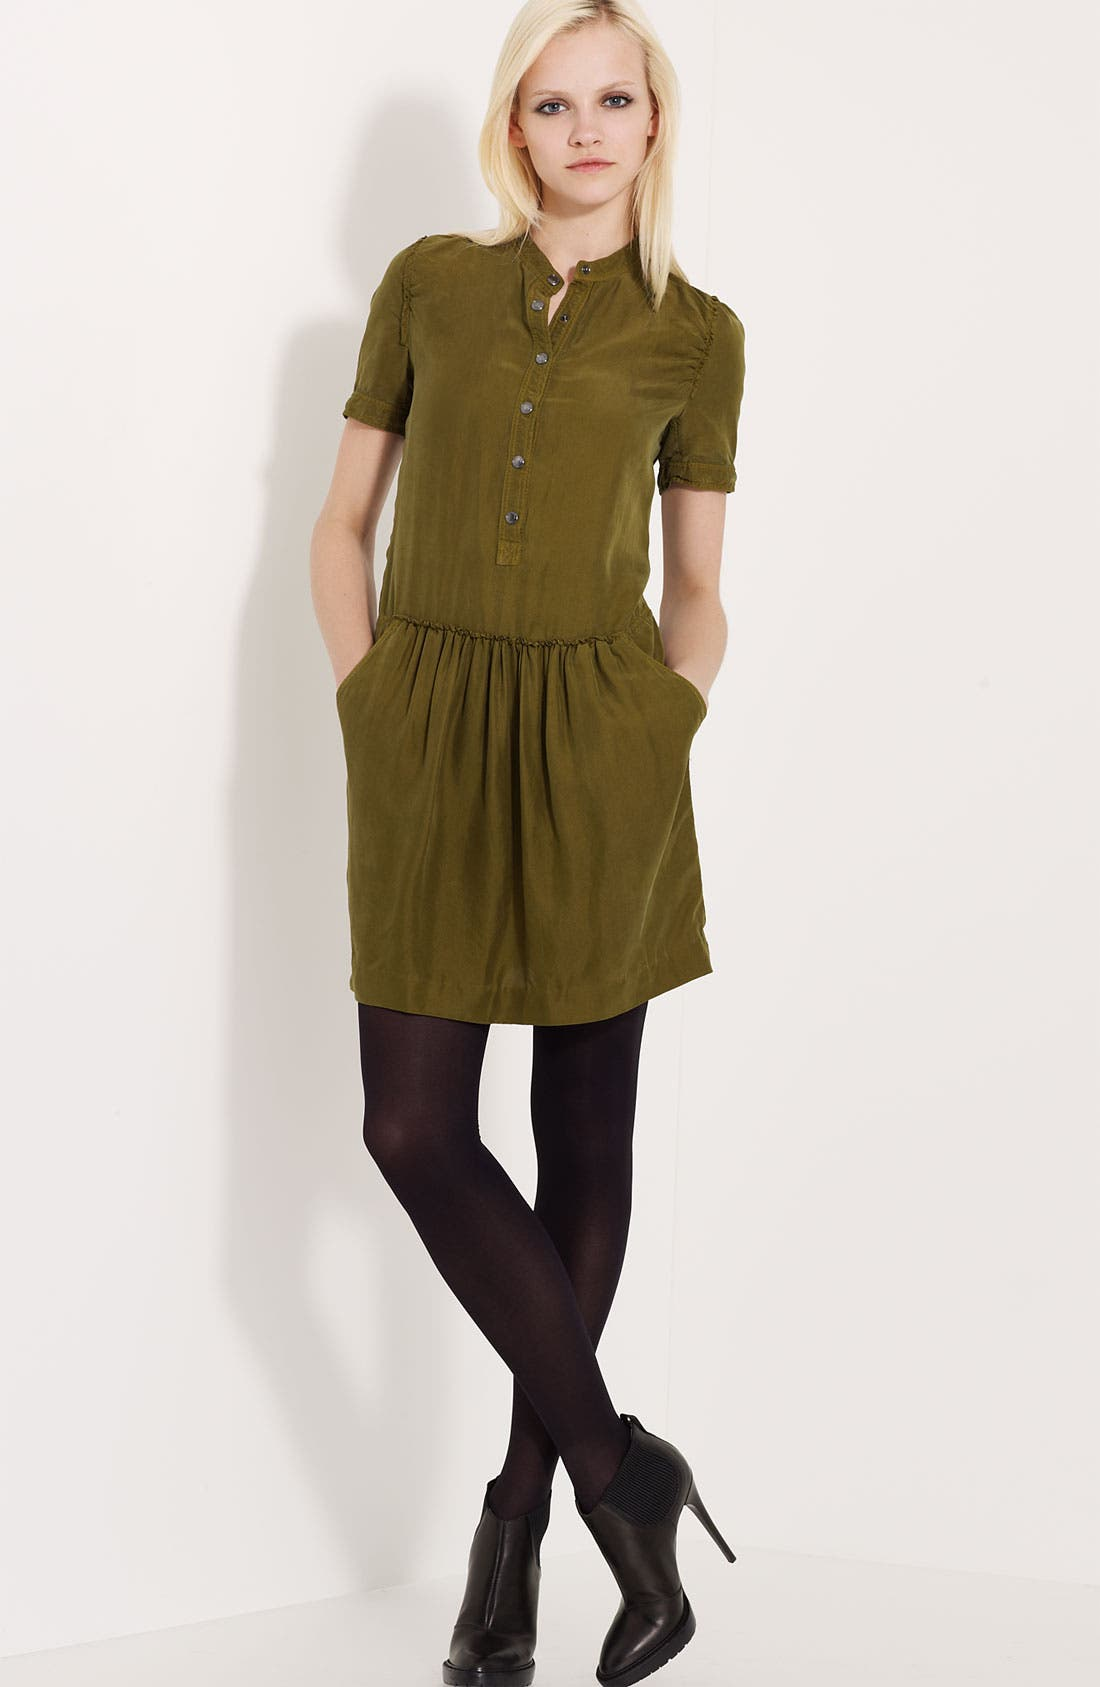 Mulberry Silk Dress,                             Main thumbnail 1, color,                             300